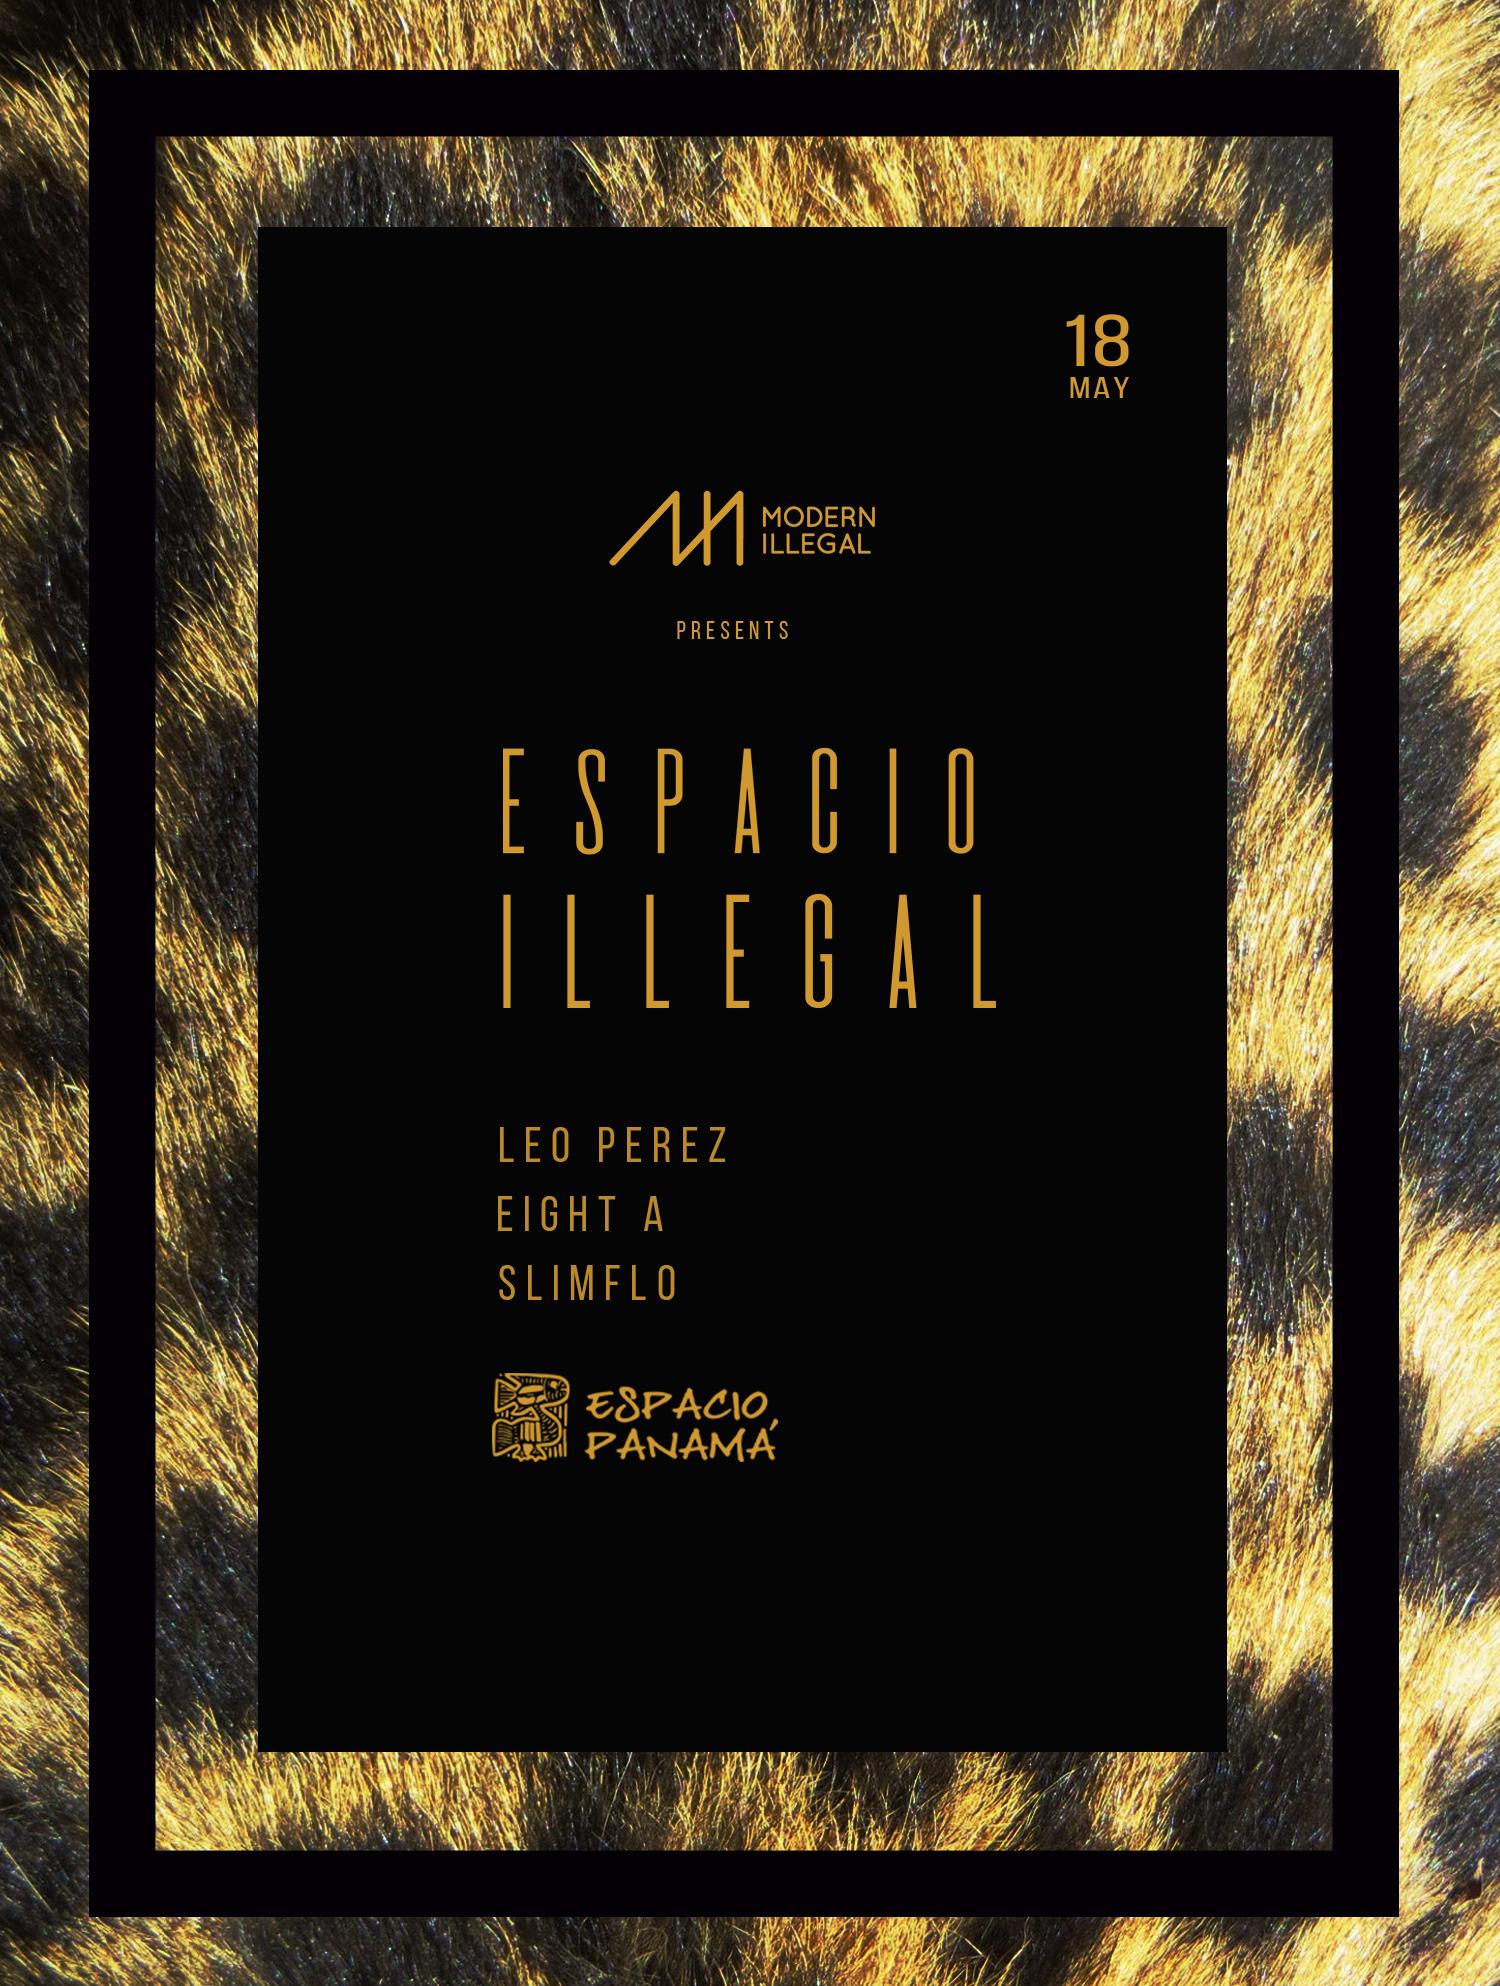 Espacio_illegal_May_postFull.jpg